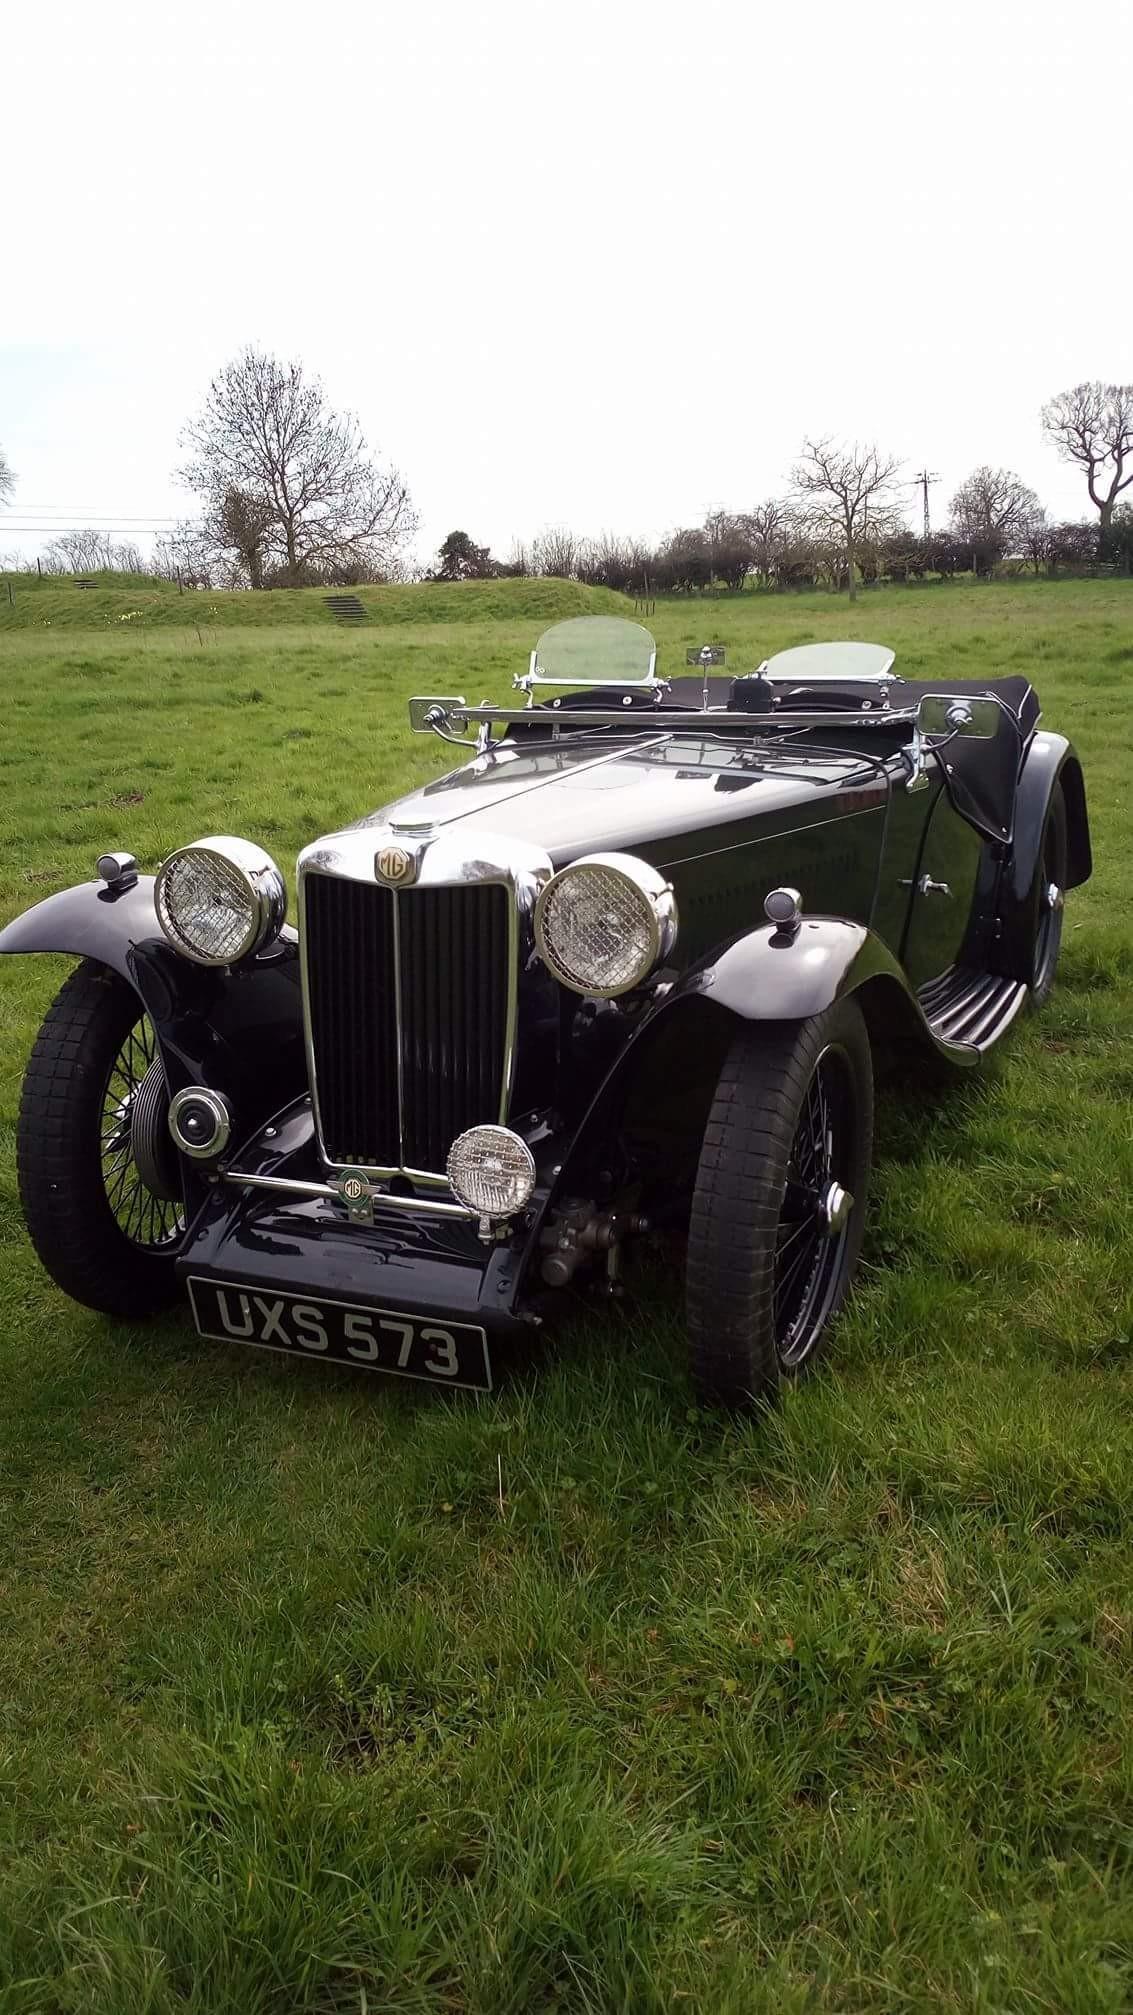 1939 MG TB Midget 379 built.